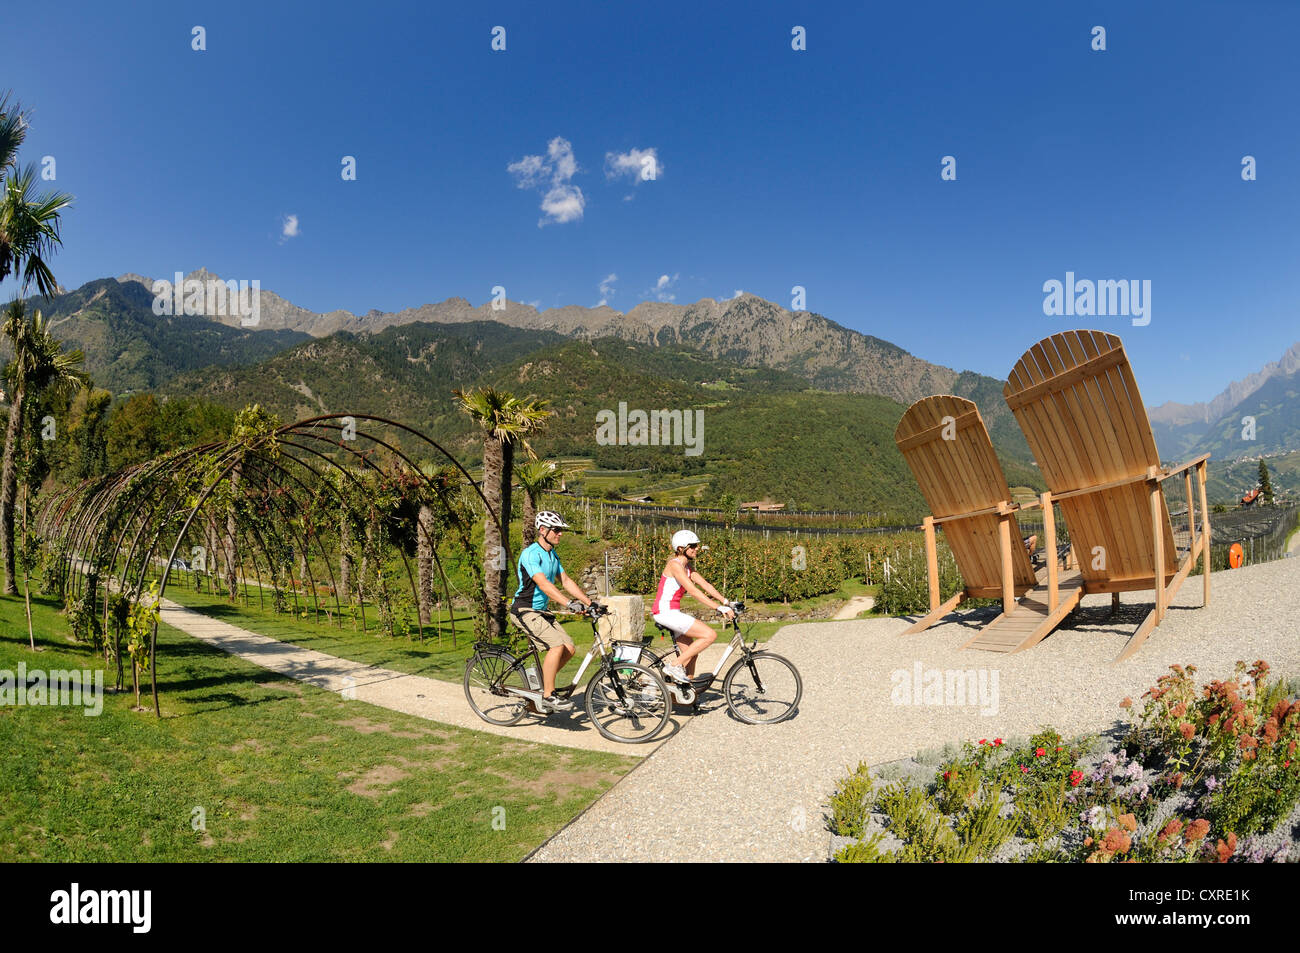 Giant Bicycles Stockfotos & Giant Bicycles Bilder - Alamy